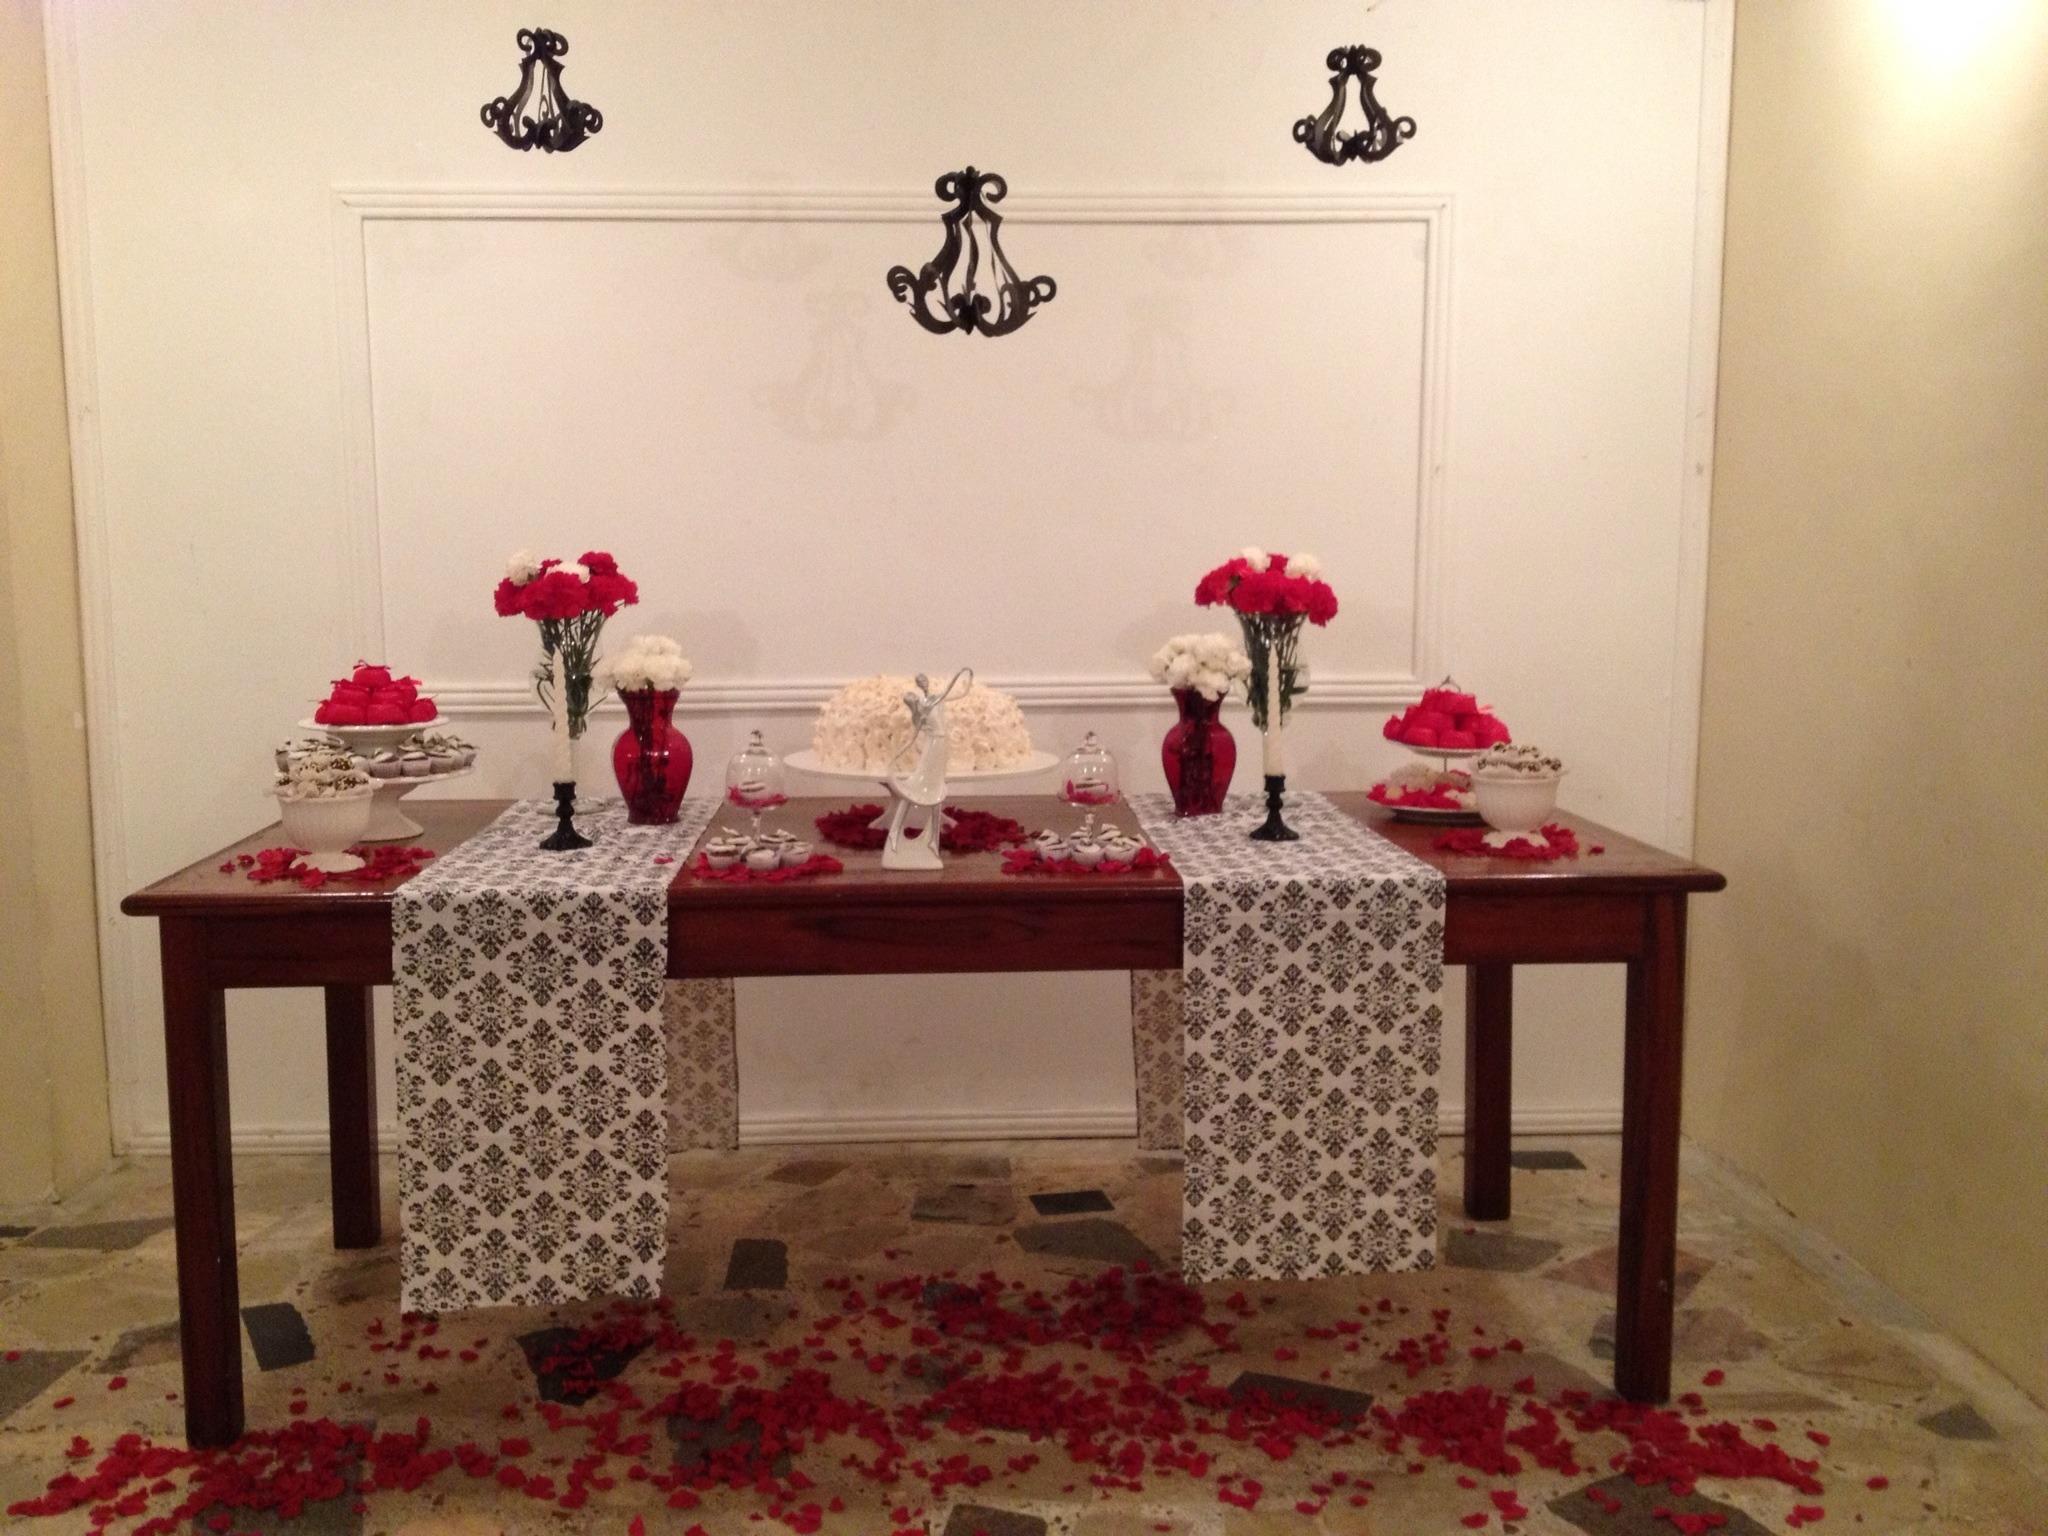 decoracao festa noivado:decoracao noivado decoracao noivado decoracao noivado decoracao